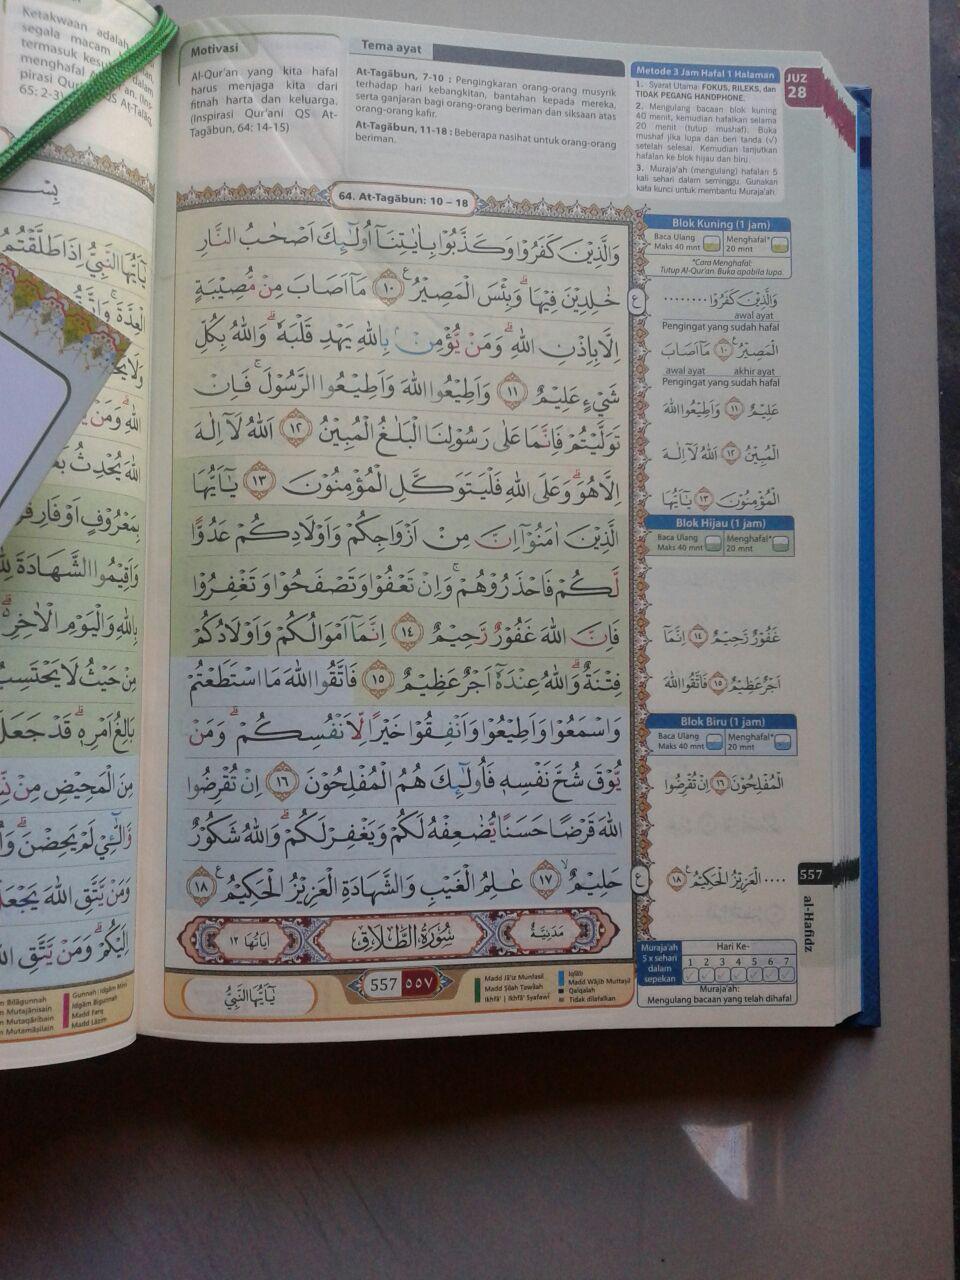 Al-Qur'an Hafalan Al-Hafidz Metode 3 jam Hafal 1 Halaman Ukuran A5 isi